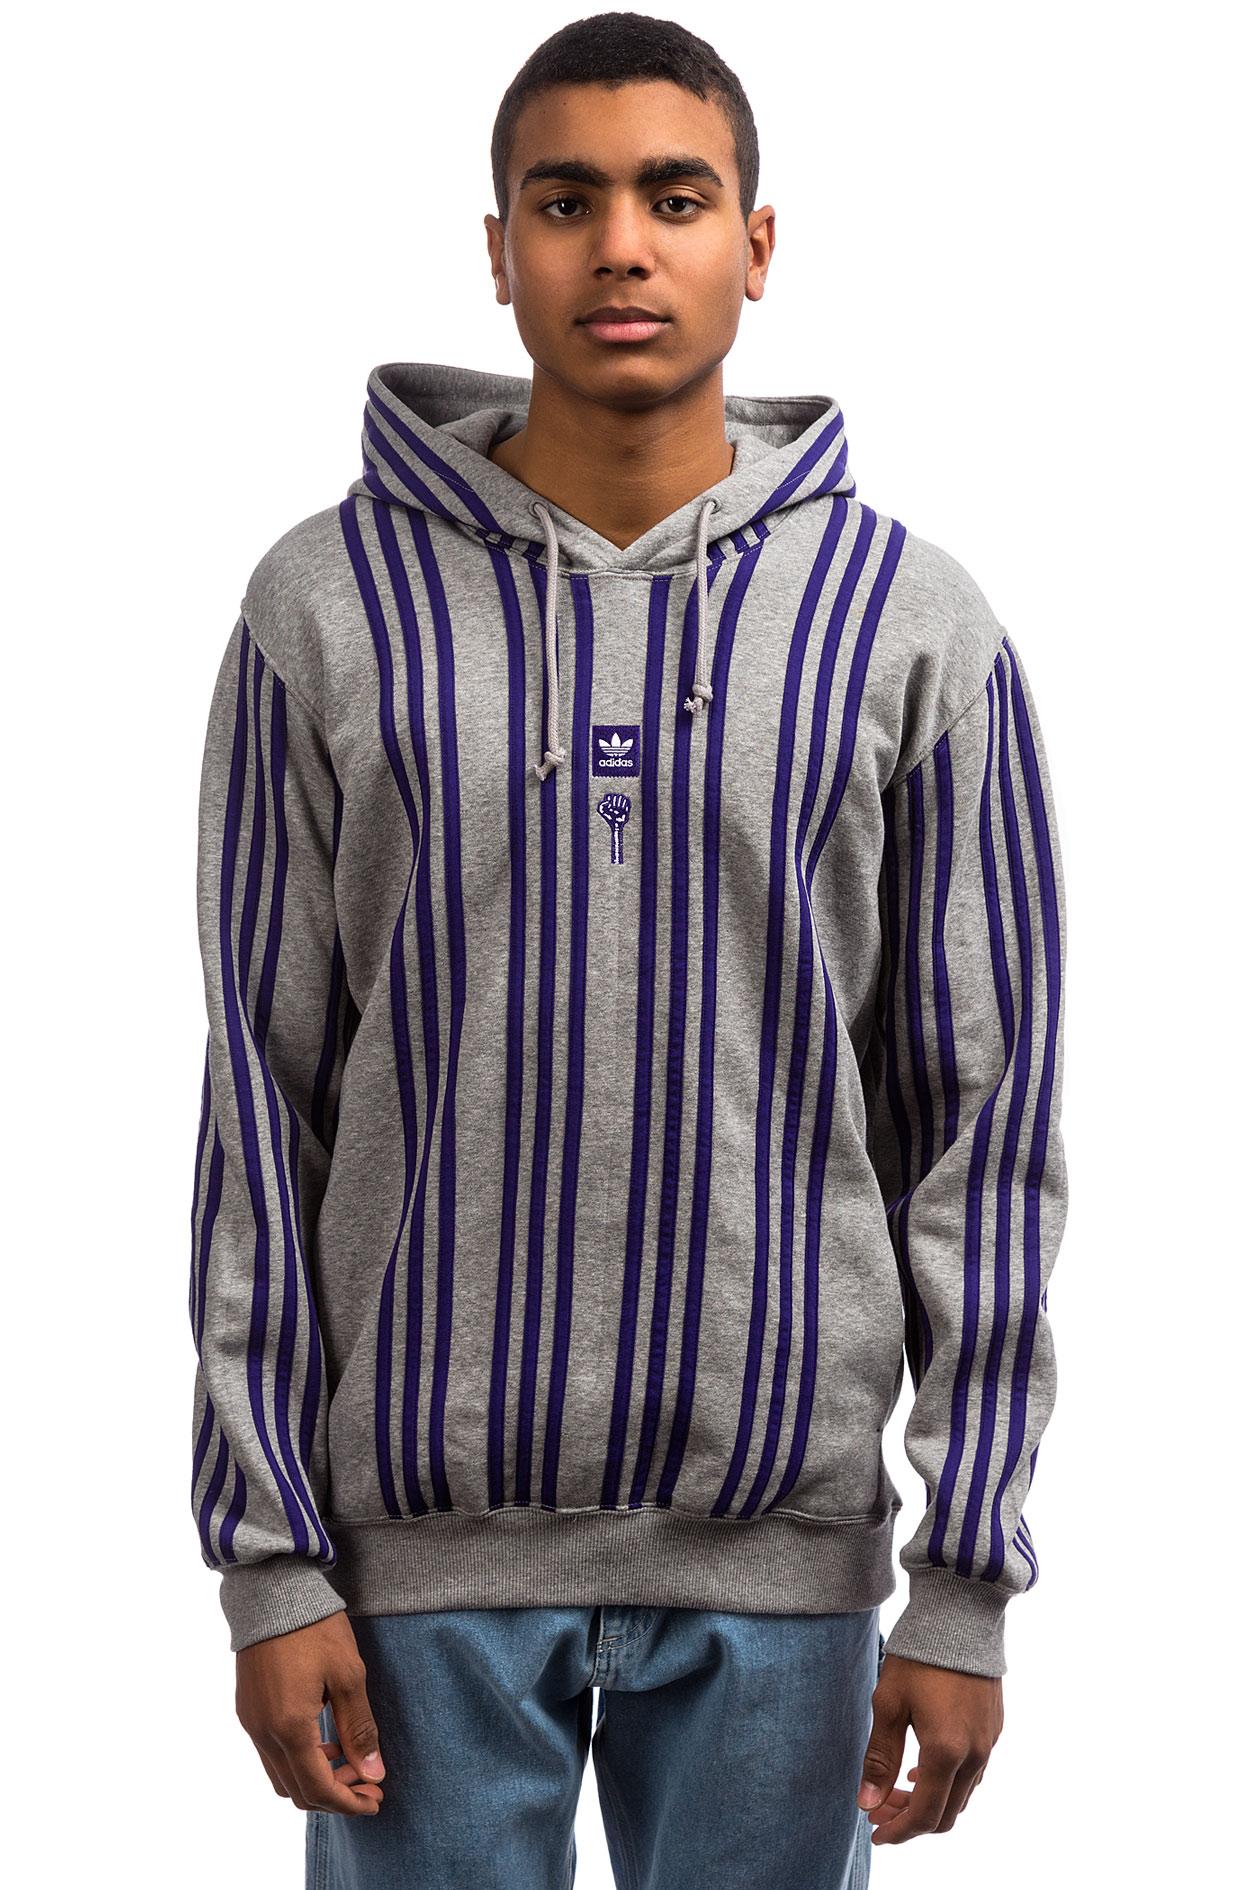 Hardies Adidas Capuchecore Collegiate Heather Purple Sweat À X 2YD9IWEH